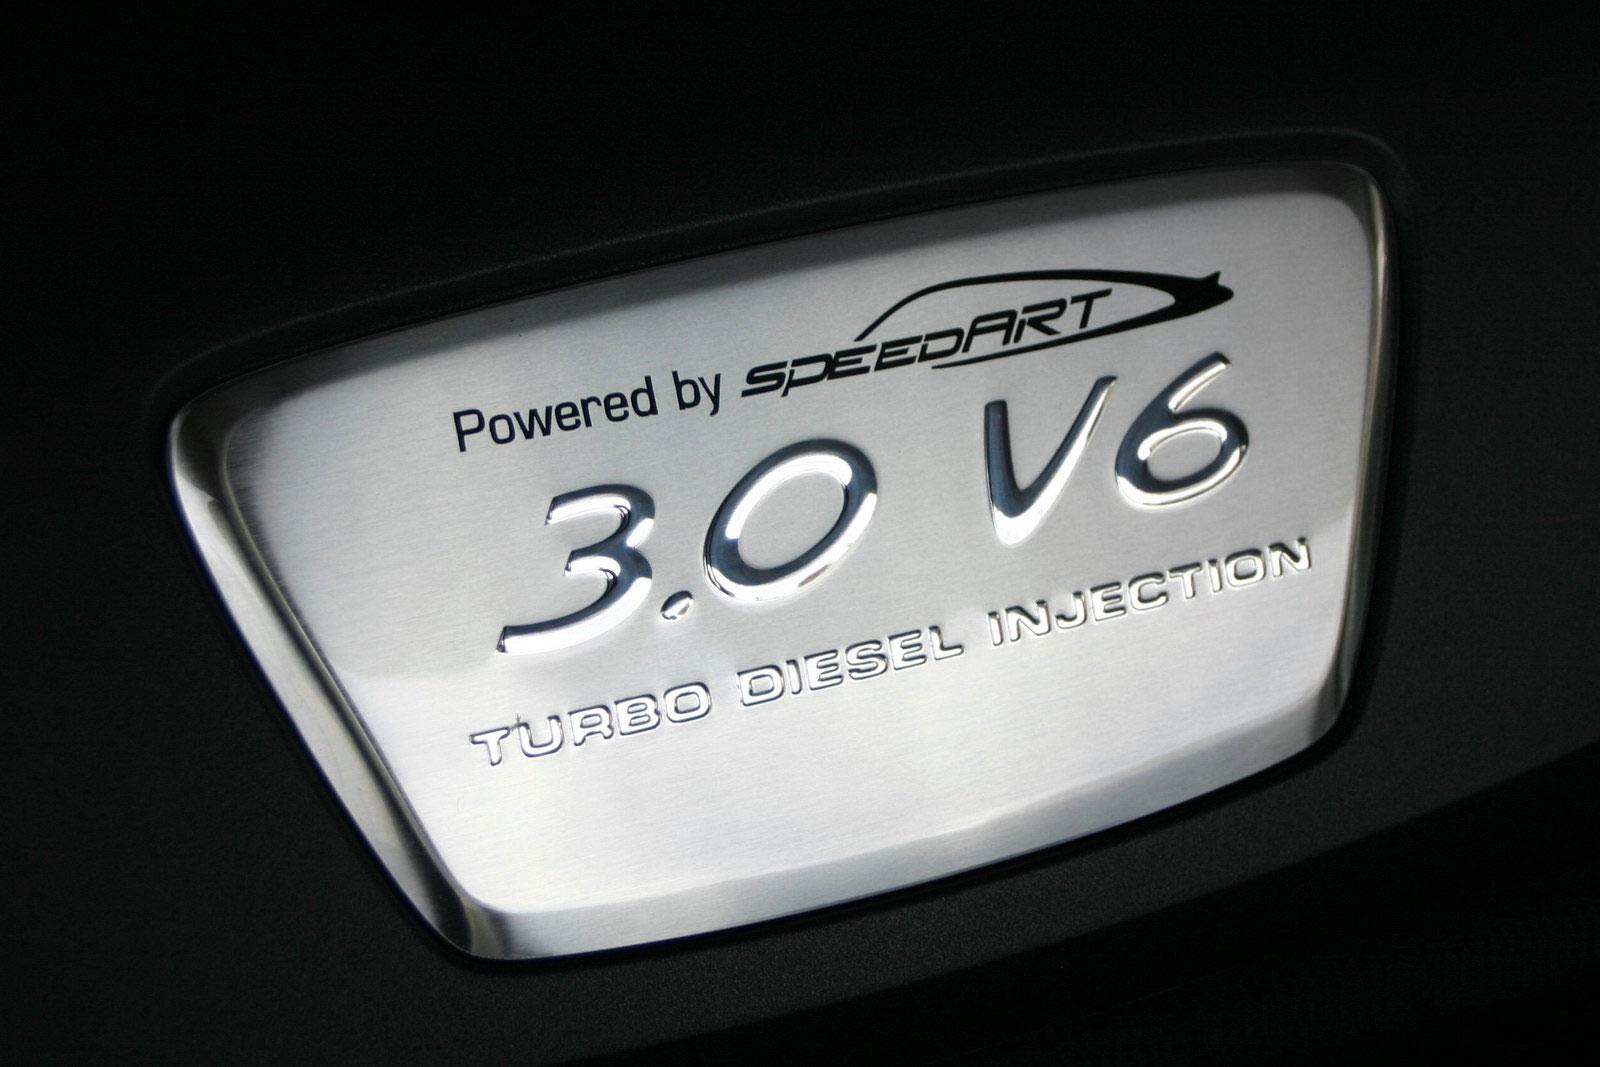 SpeedArt PS9-300D vyšperkovaný nafťák 5